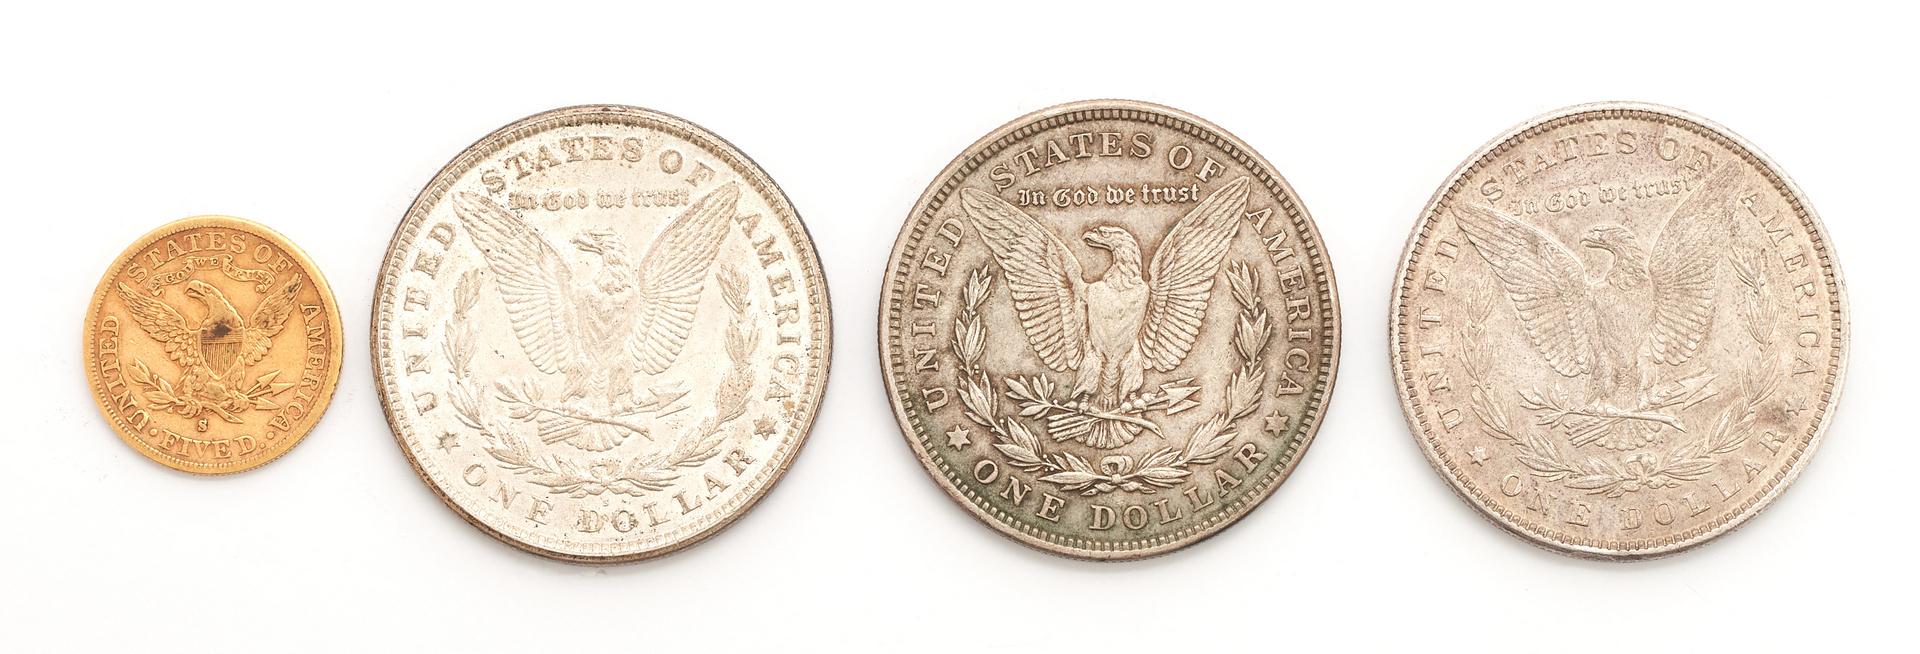 Lot 836: 1881 $5 Liberty Gold Coin & 3 Morgans, 4 items